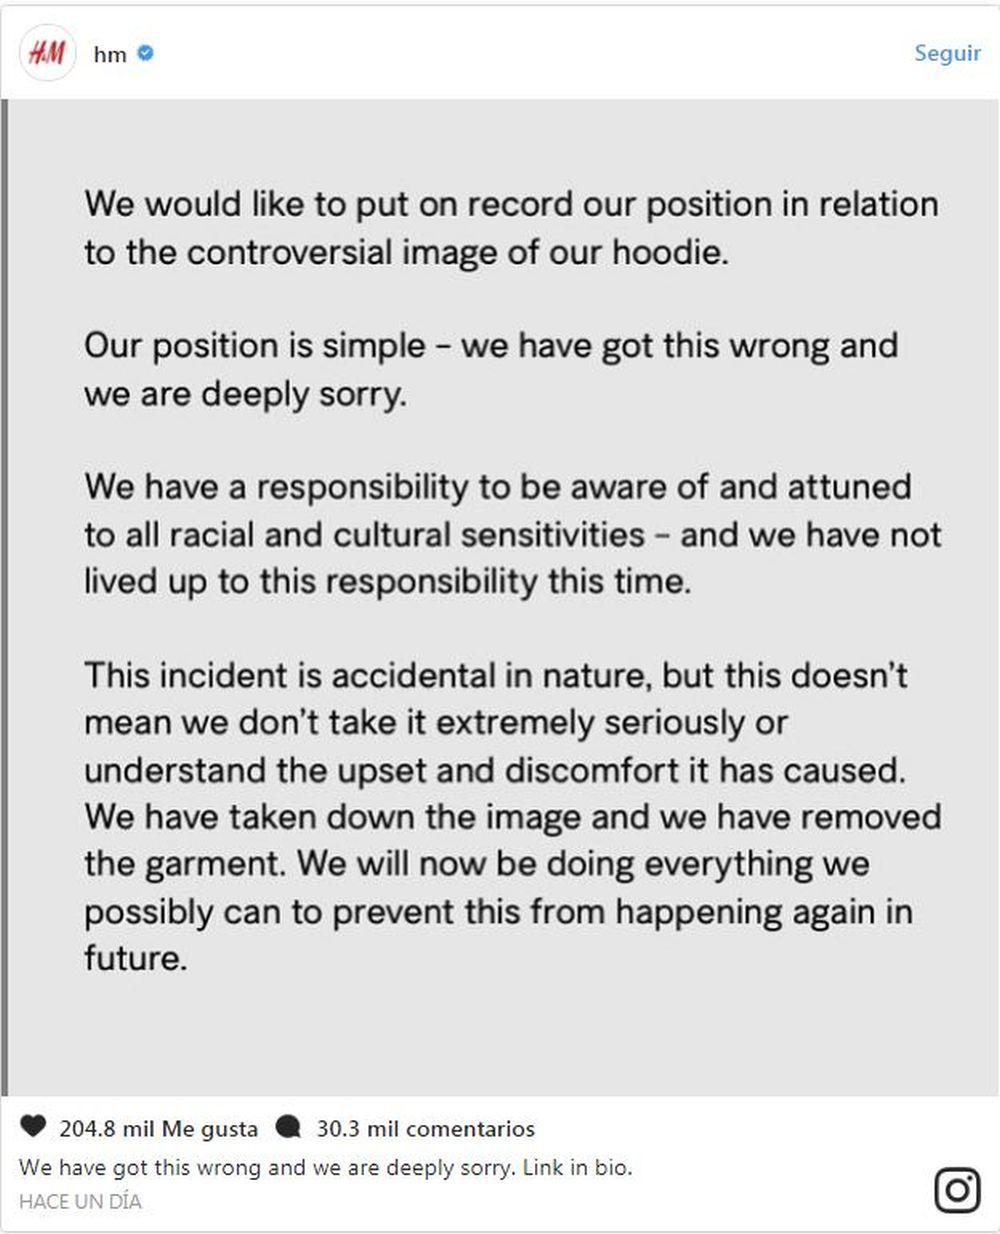 Comunicado oficial pidiendo disculpas